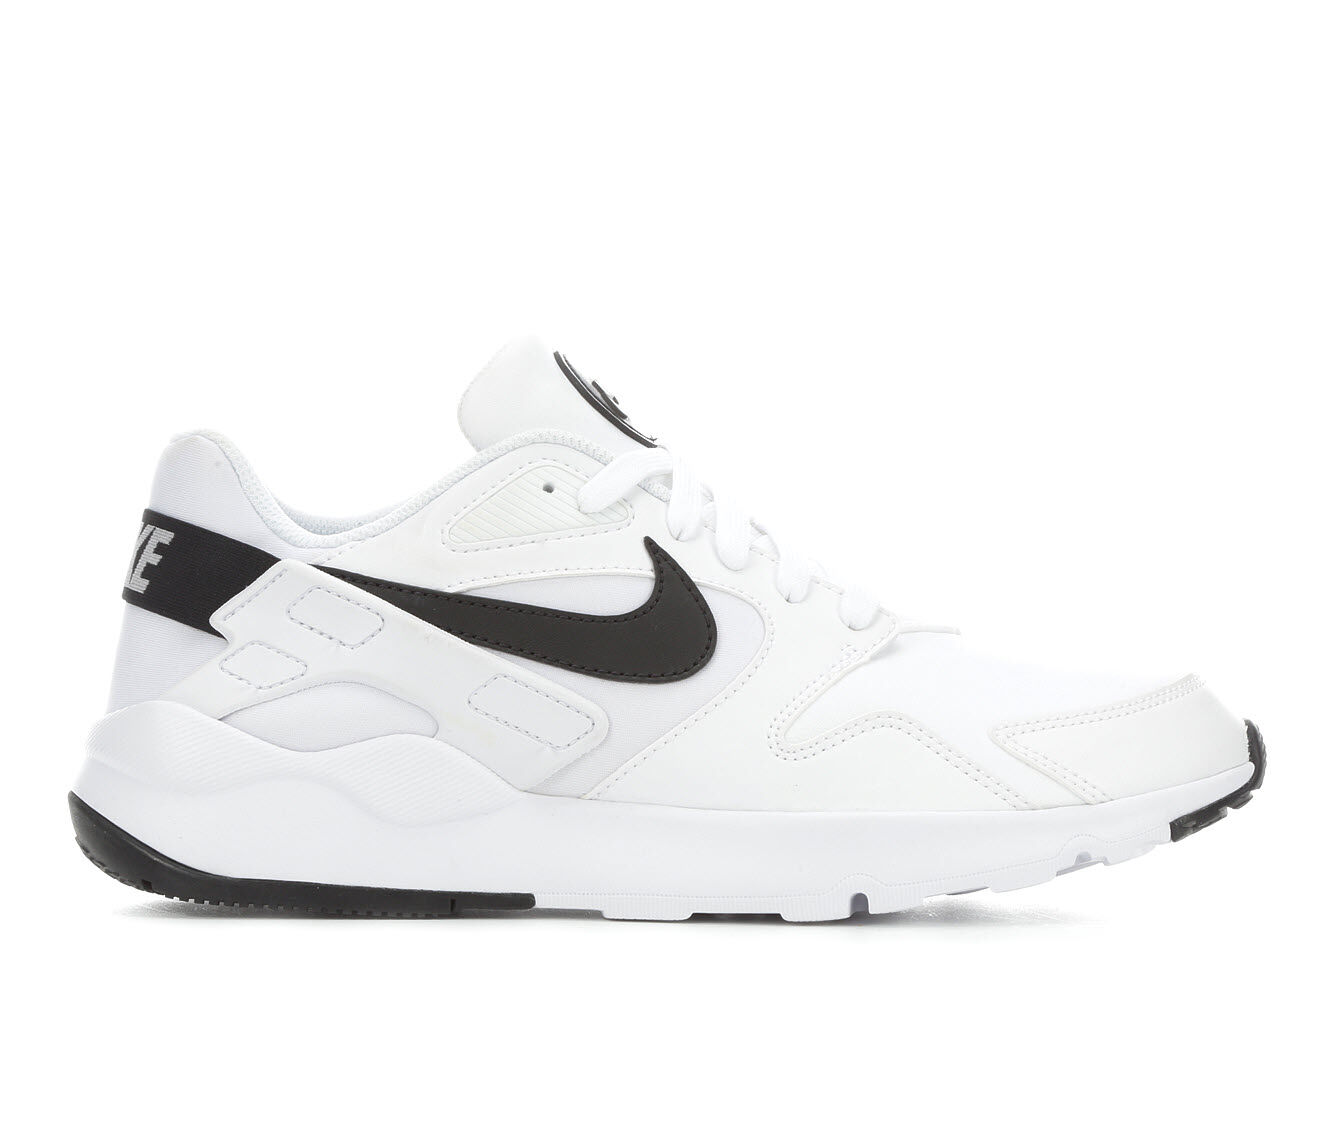 uk shoes_kd1844